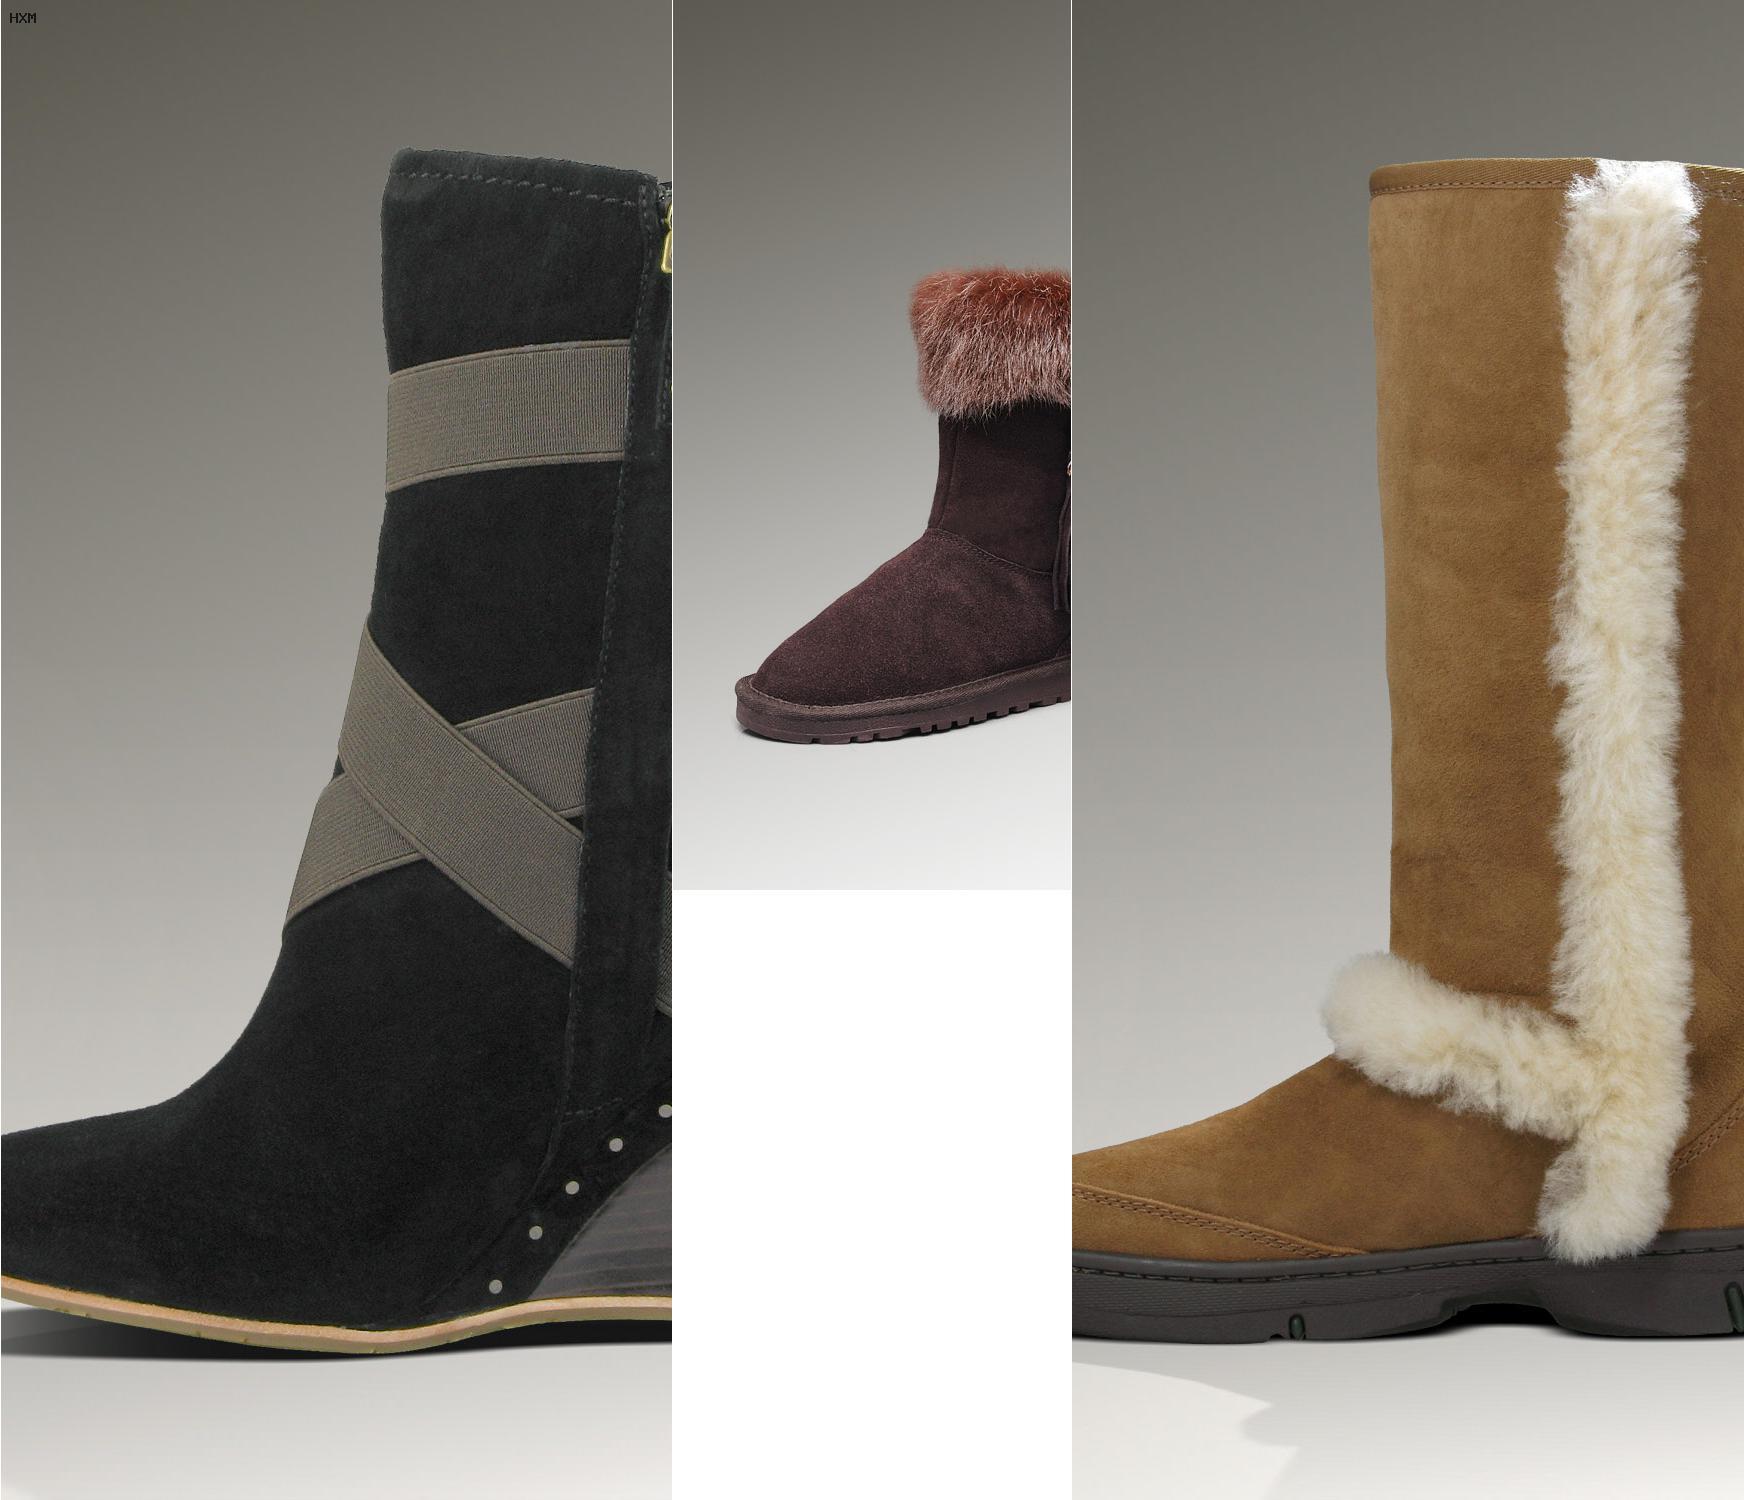 comprar botas ugg online verdaderas